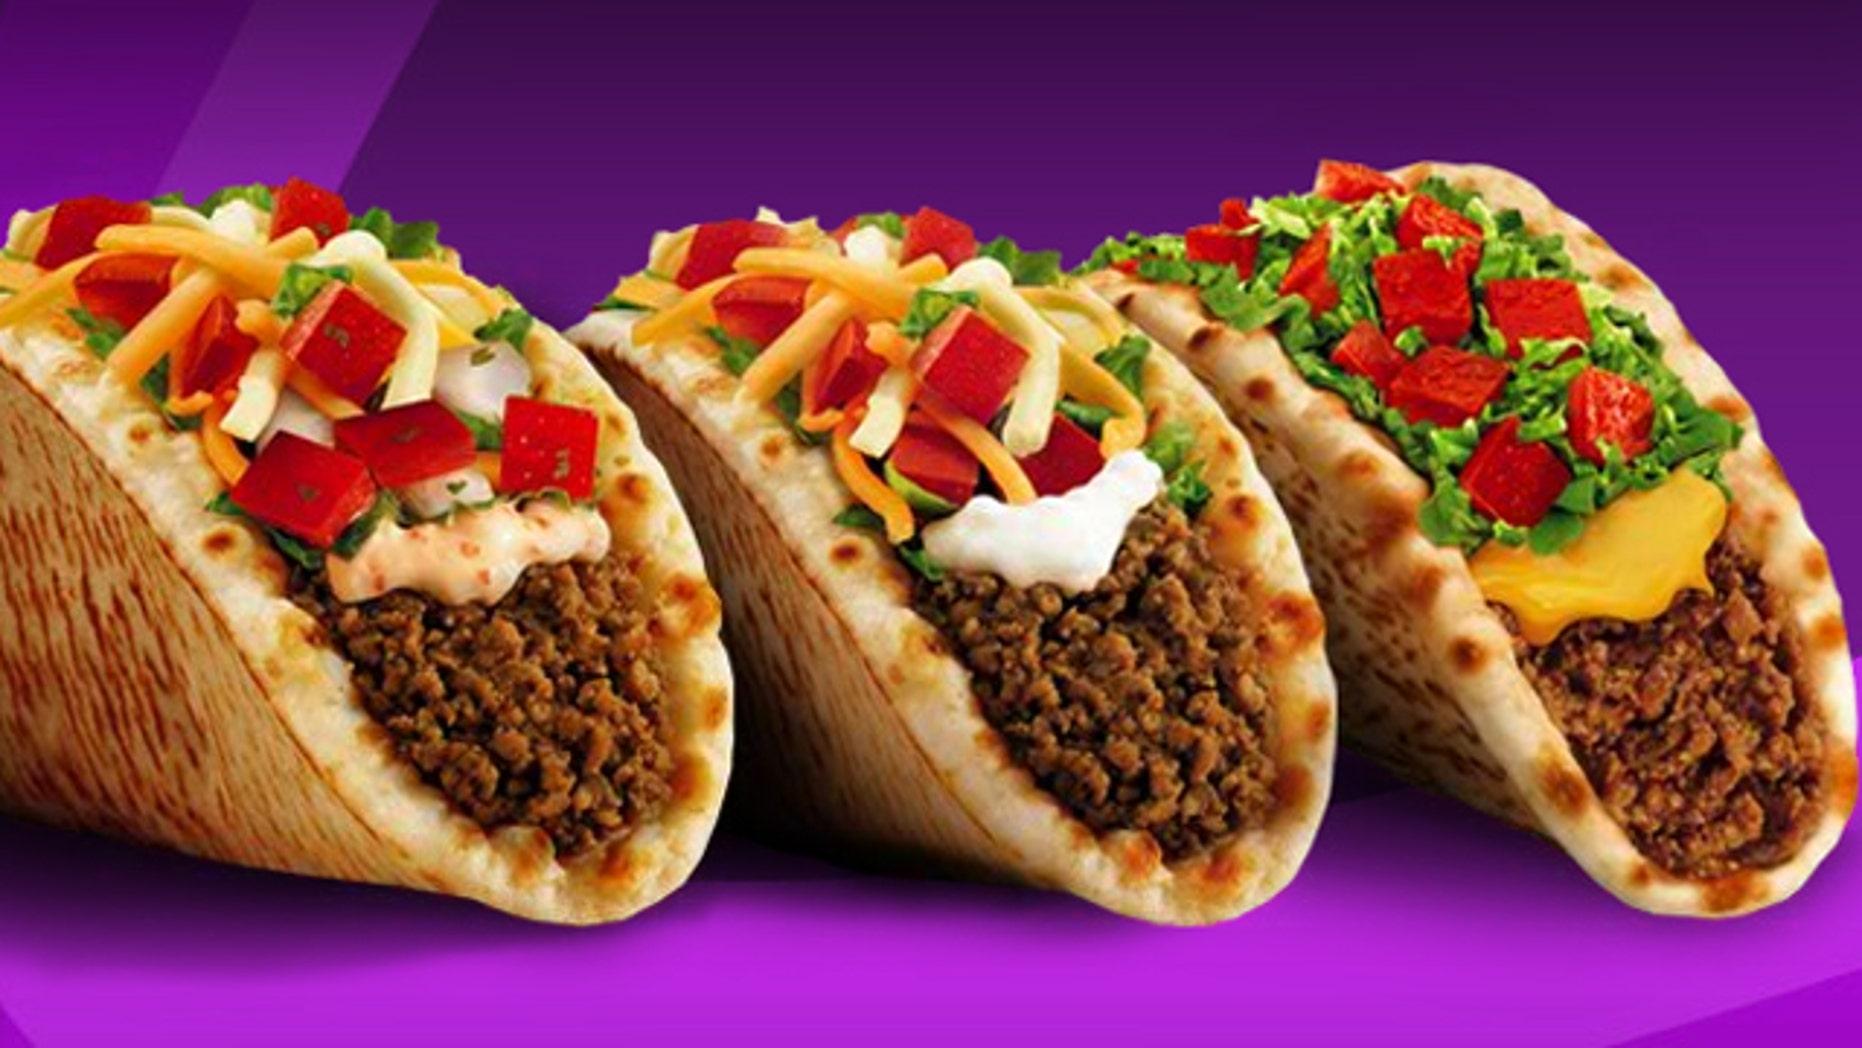 Taco Bell's Gorditas